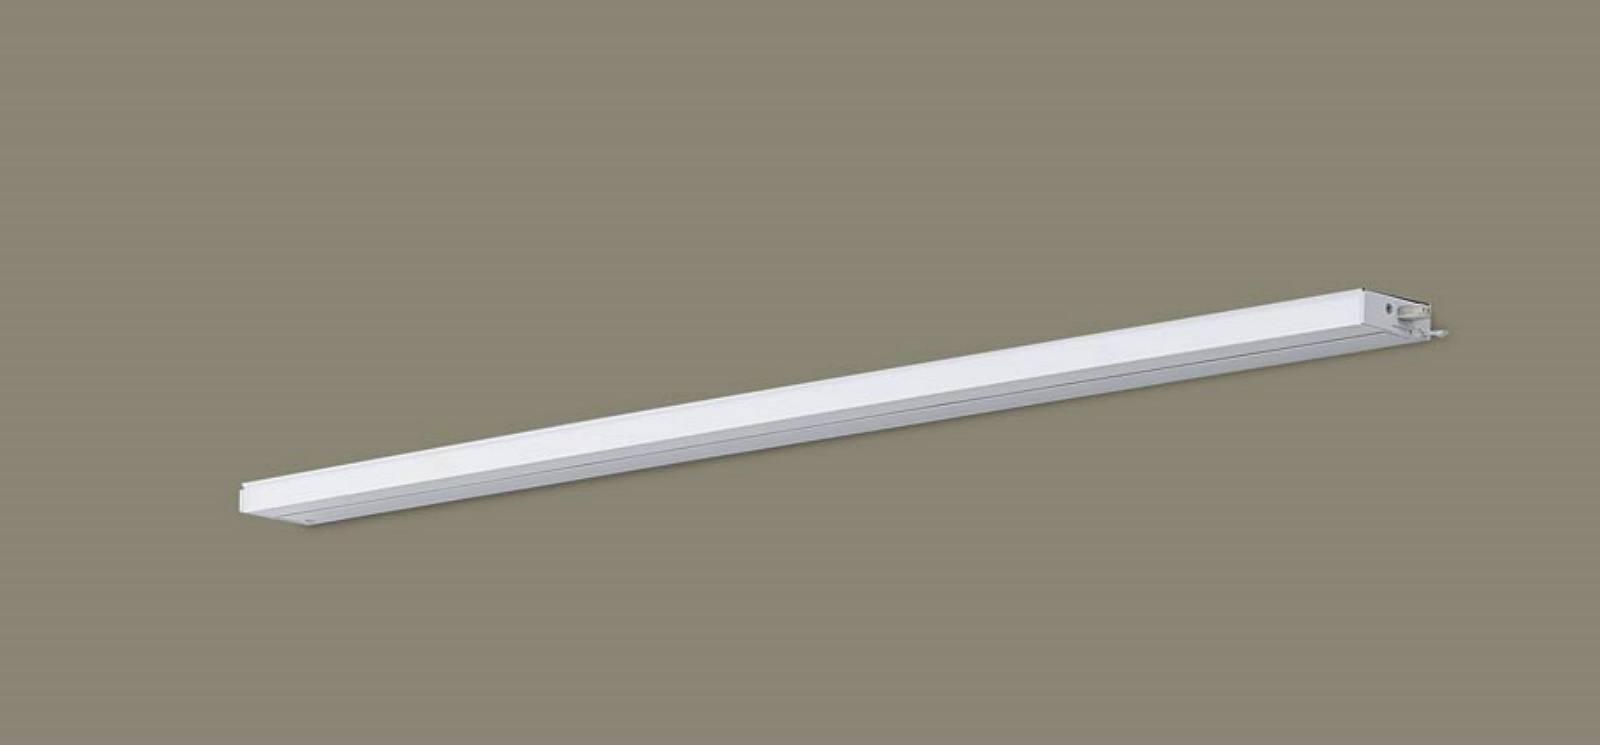 T区分 パナソニック LGB51351XG1 ベースライト 建築化照明器具 単独使用不可 畳数設定無し LED【setsuden_led】